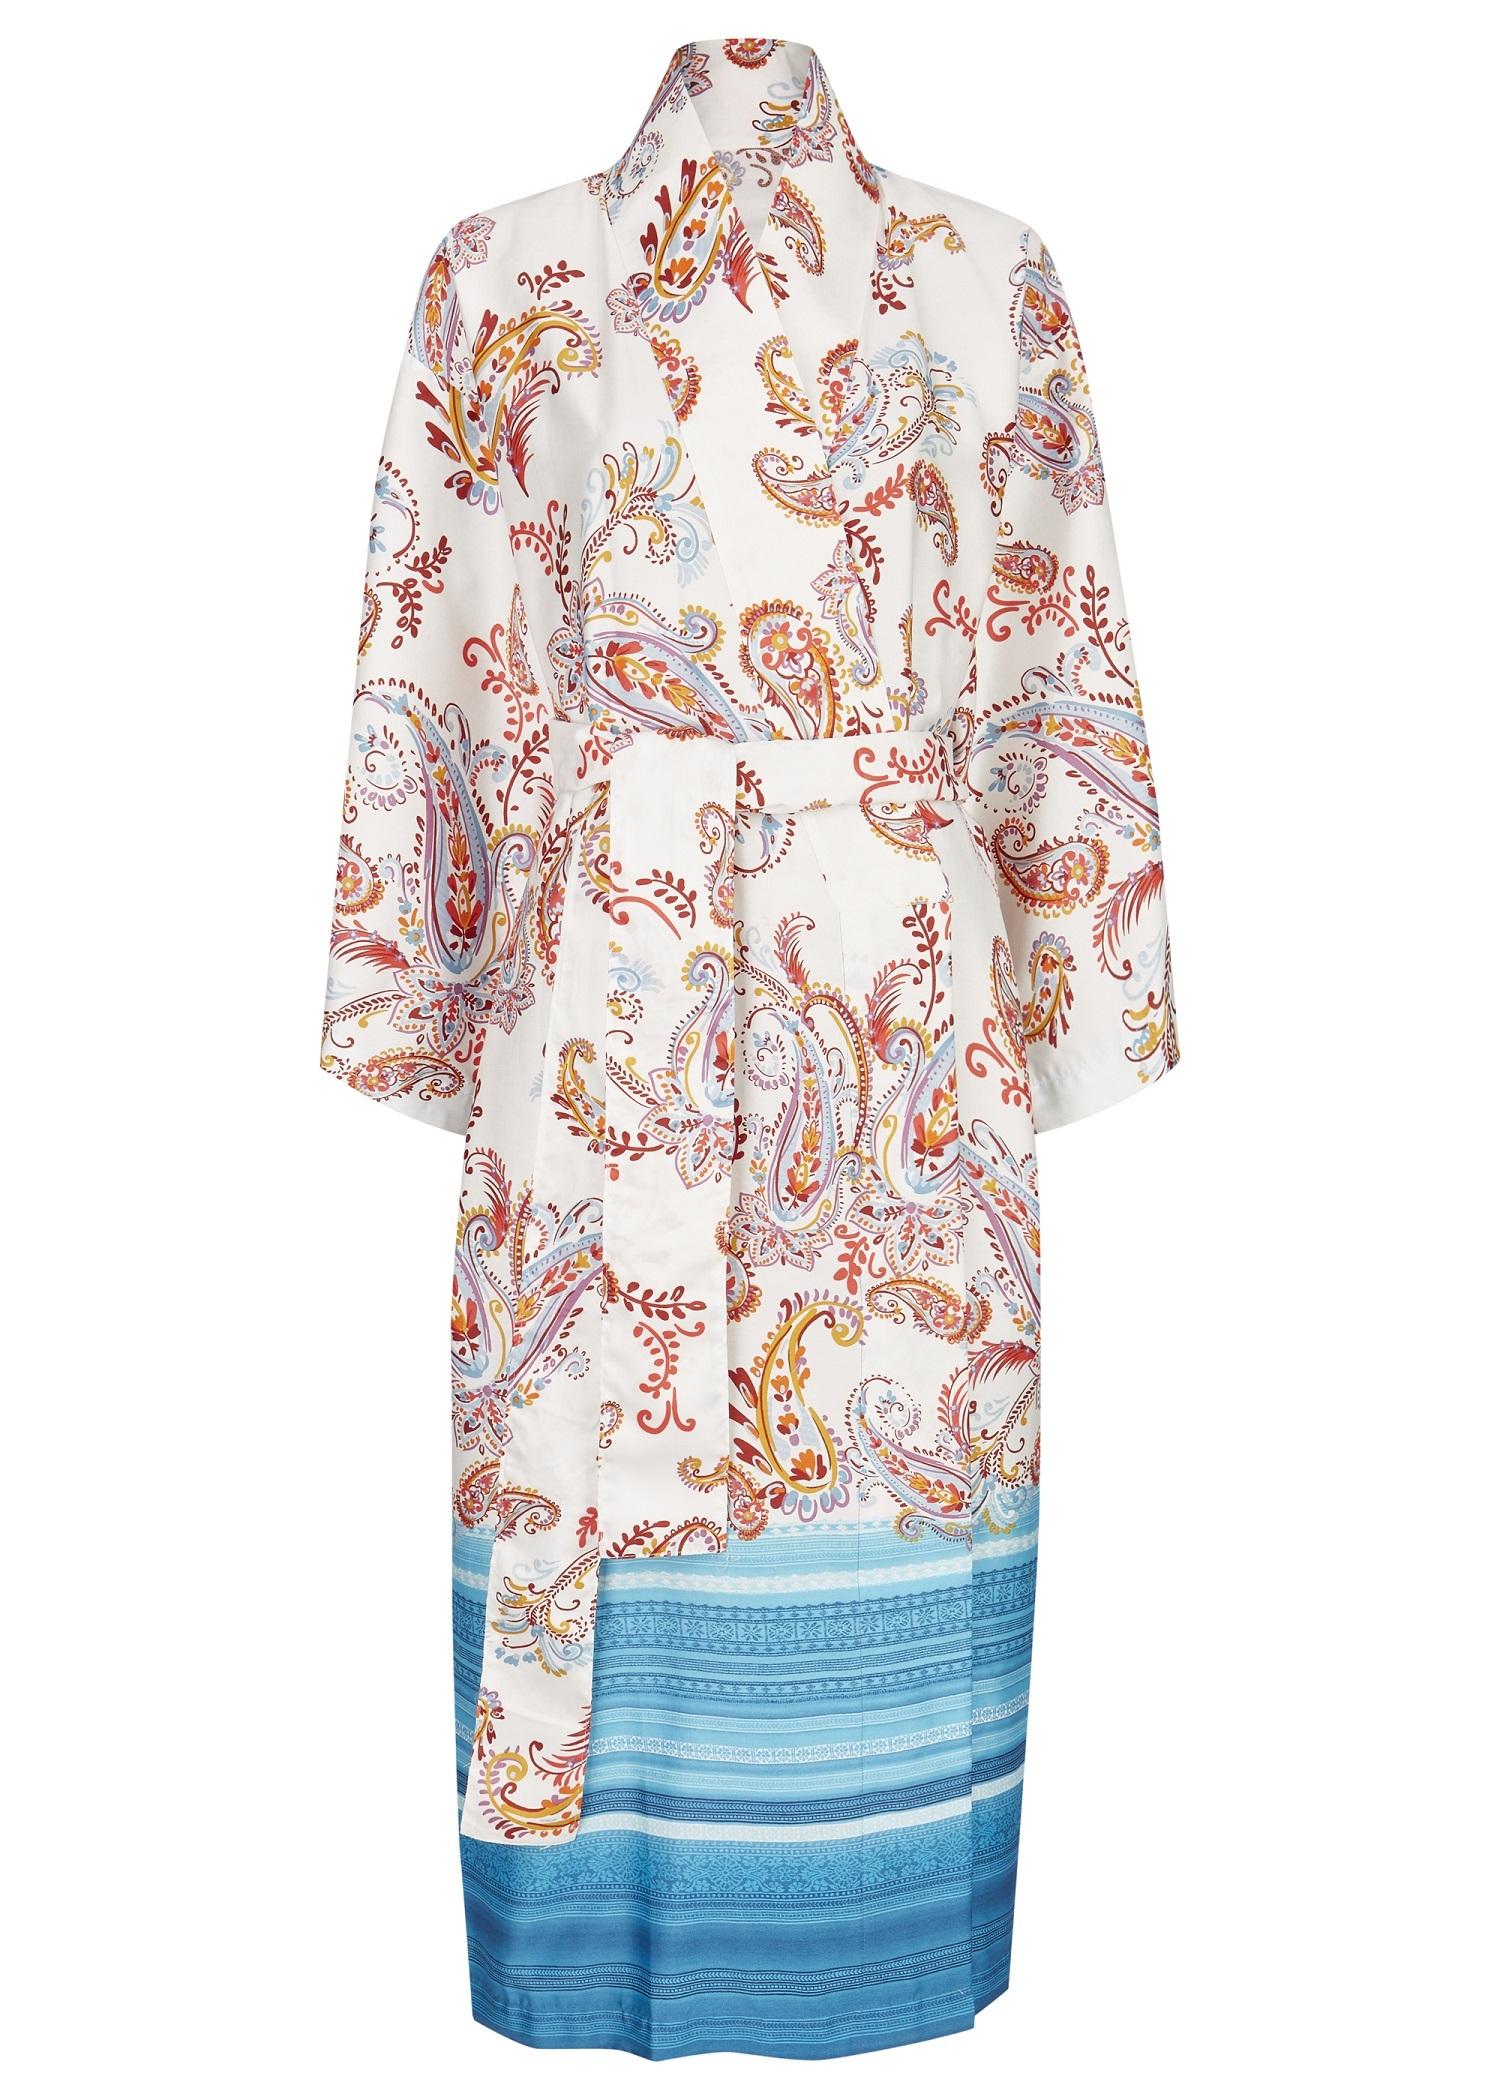 bassetti Kimono Tosca B1 Blau 9311850 Größe S-M Gr. 36-42 neue Kollektion